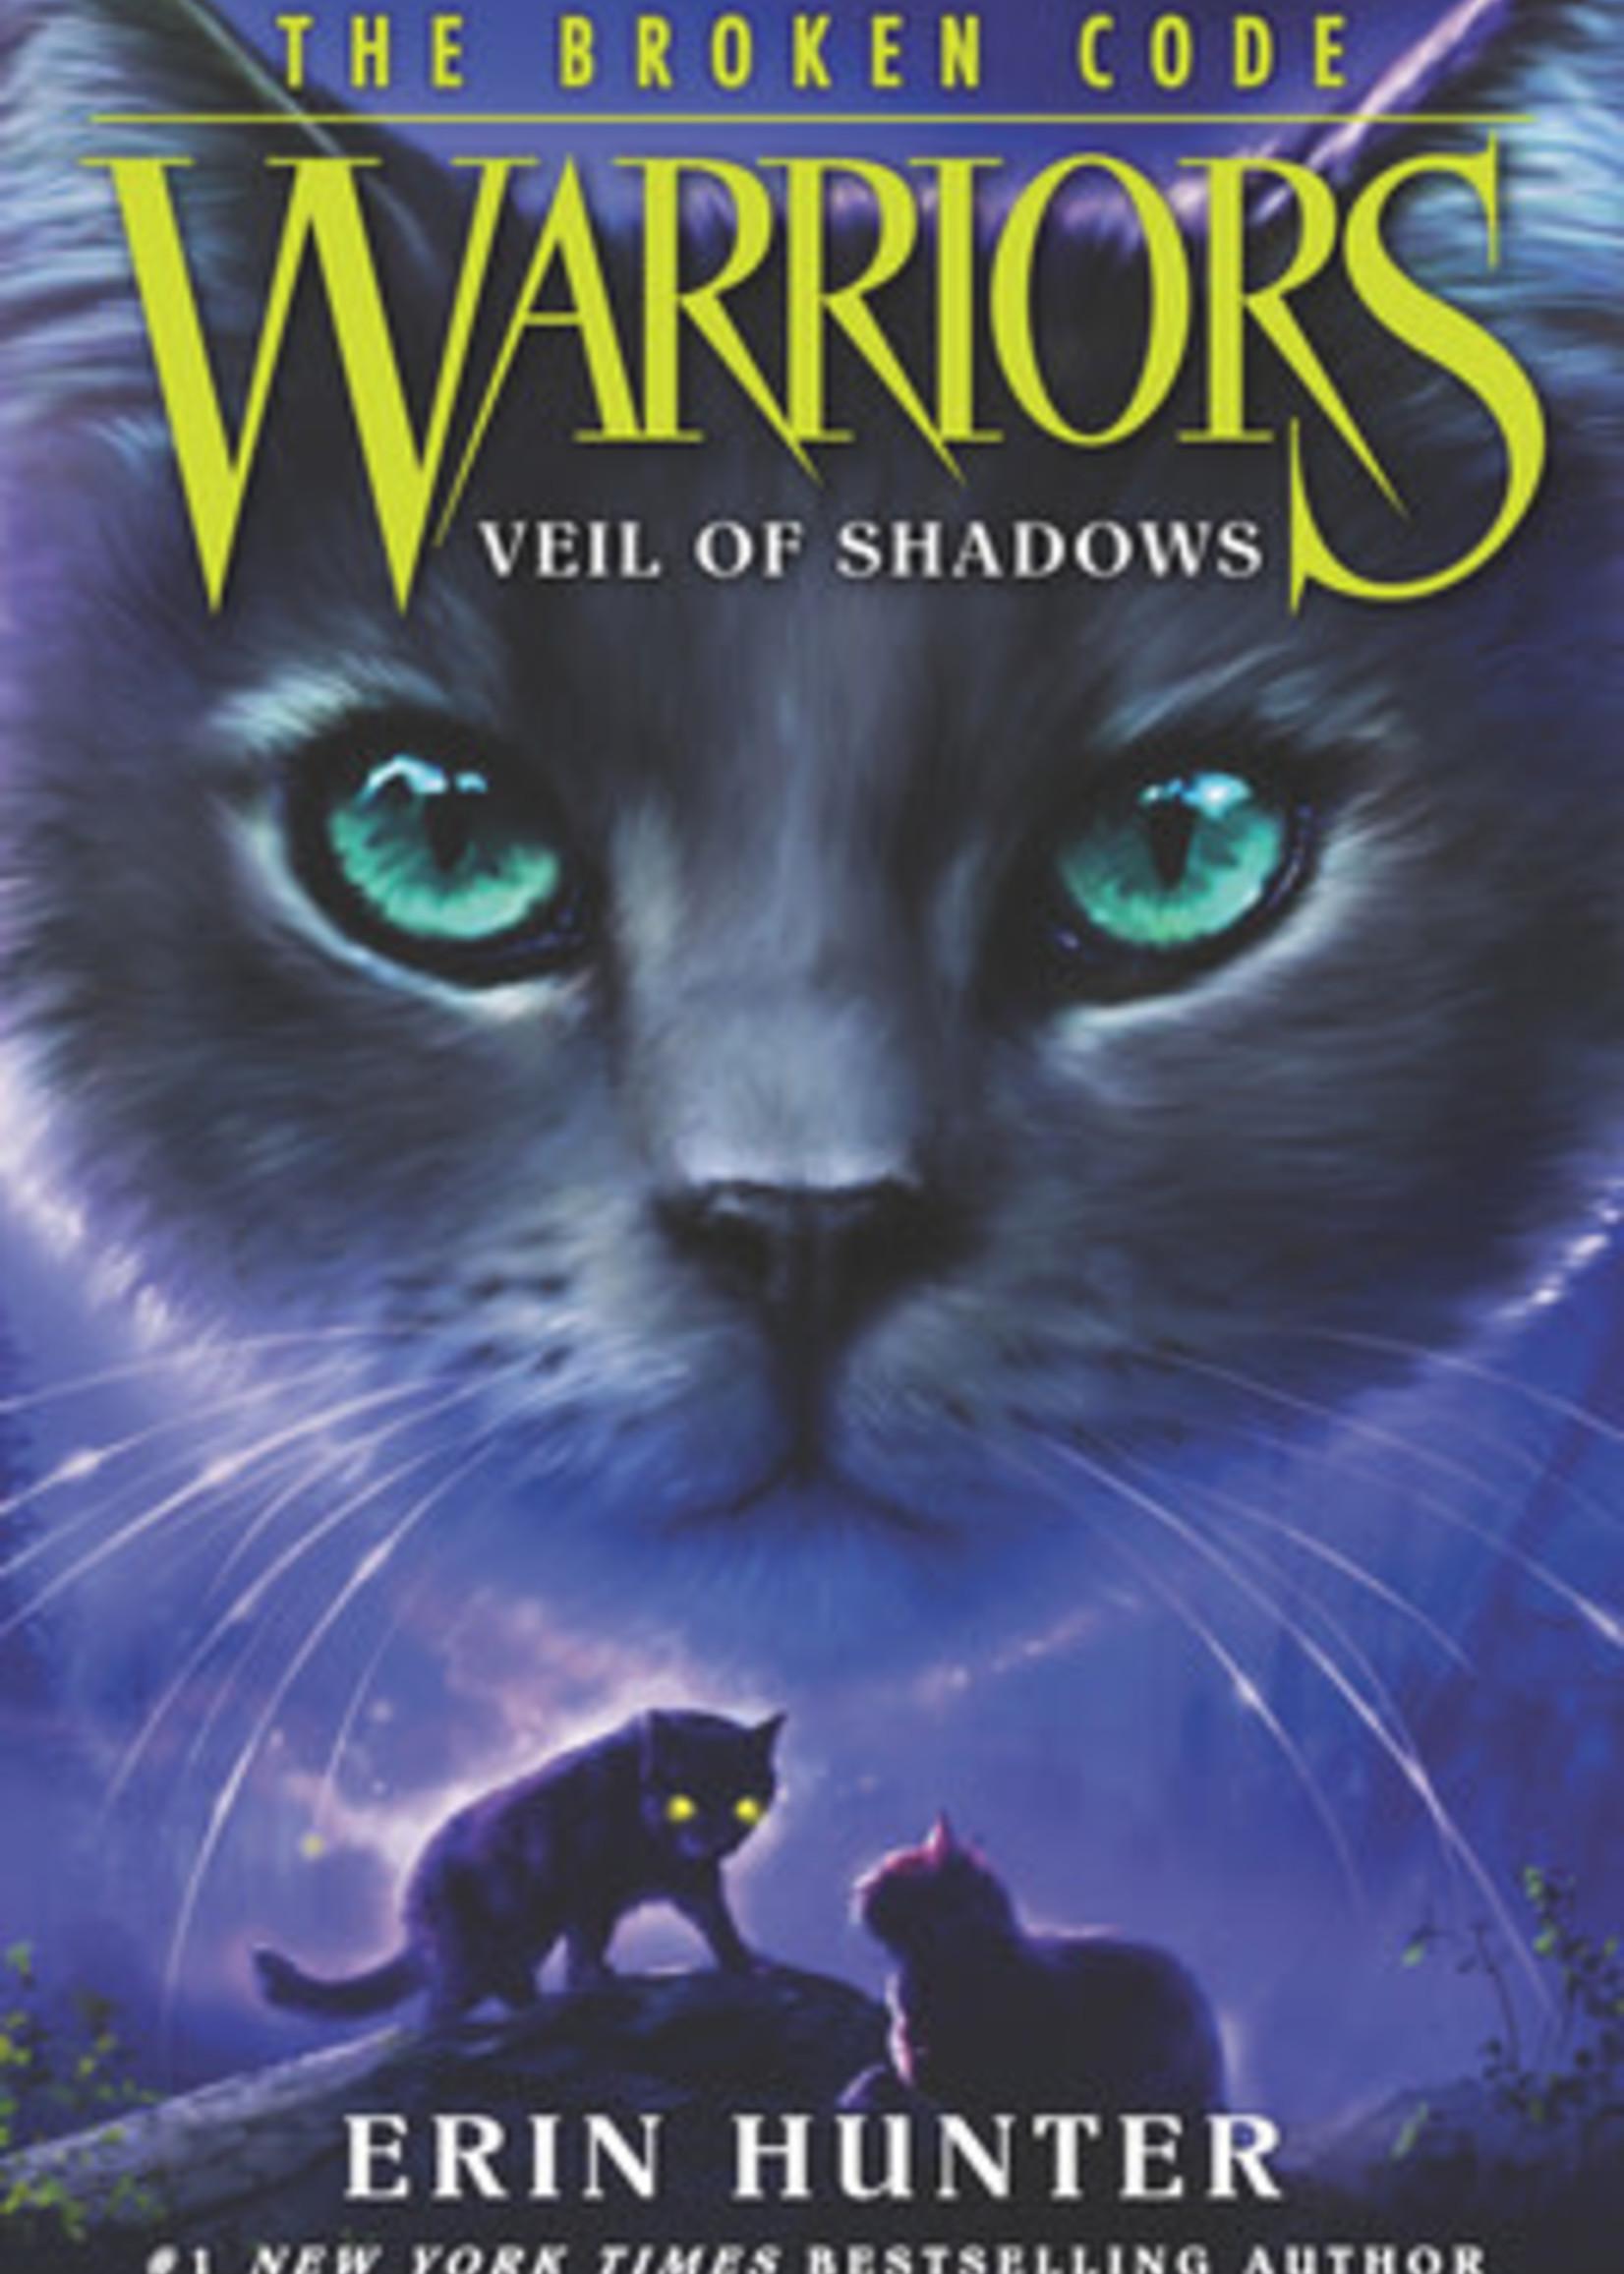 Veil of Shadows (Warriors: The Broken Code #3) by Erin Hunter